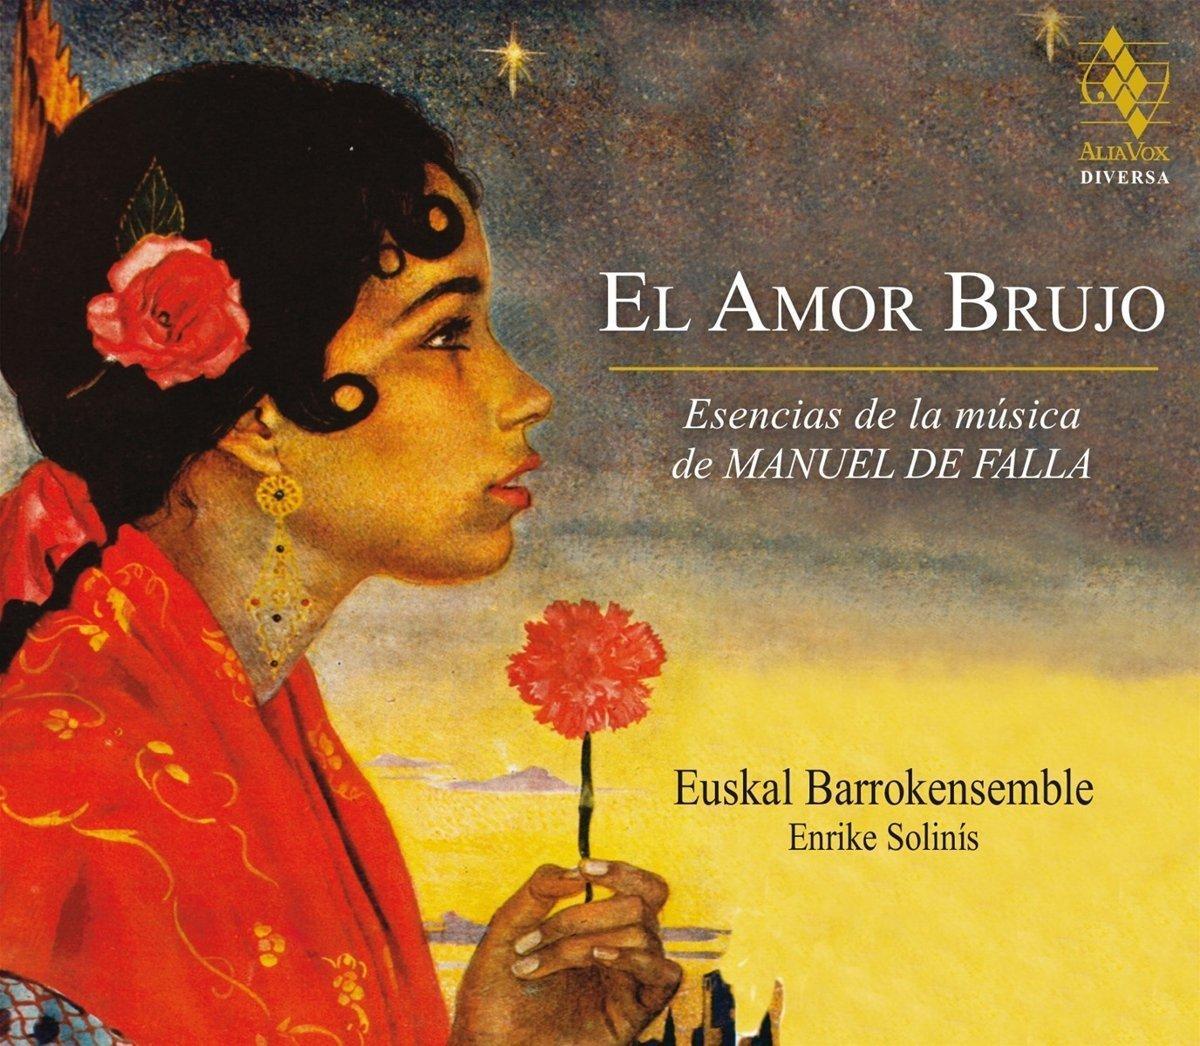 Falla: El Amor Brujo - The Essence of Manuel de Falla's Music